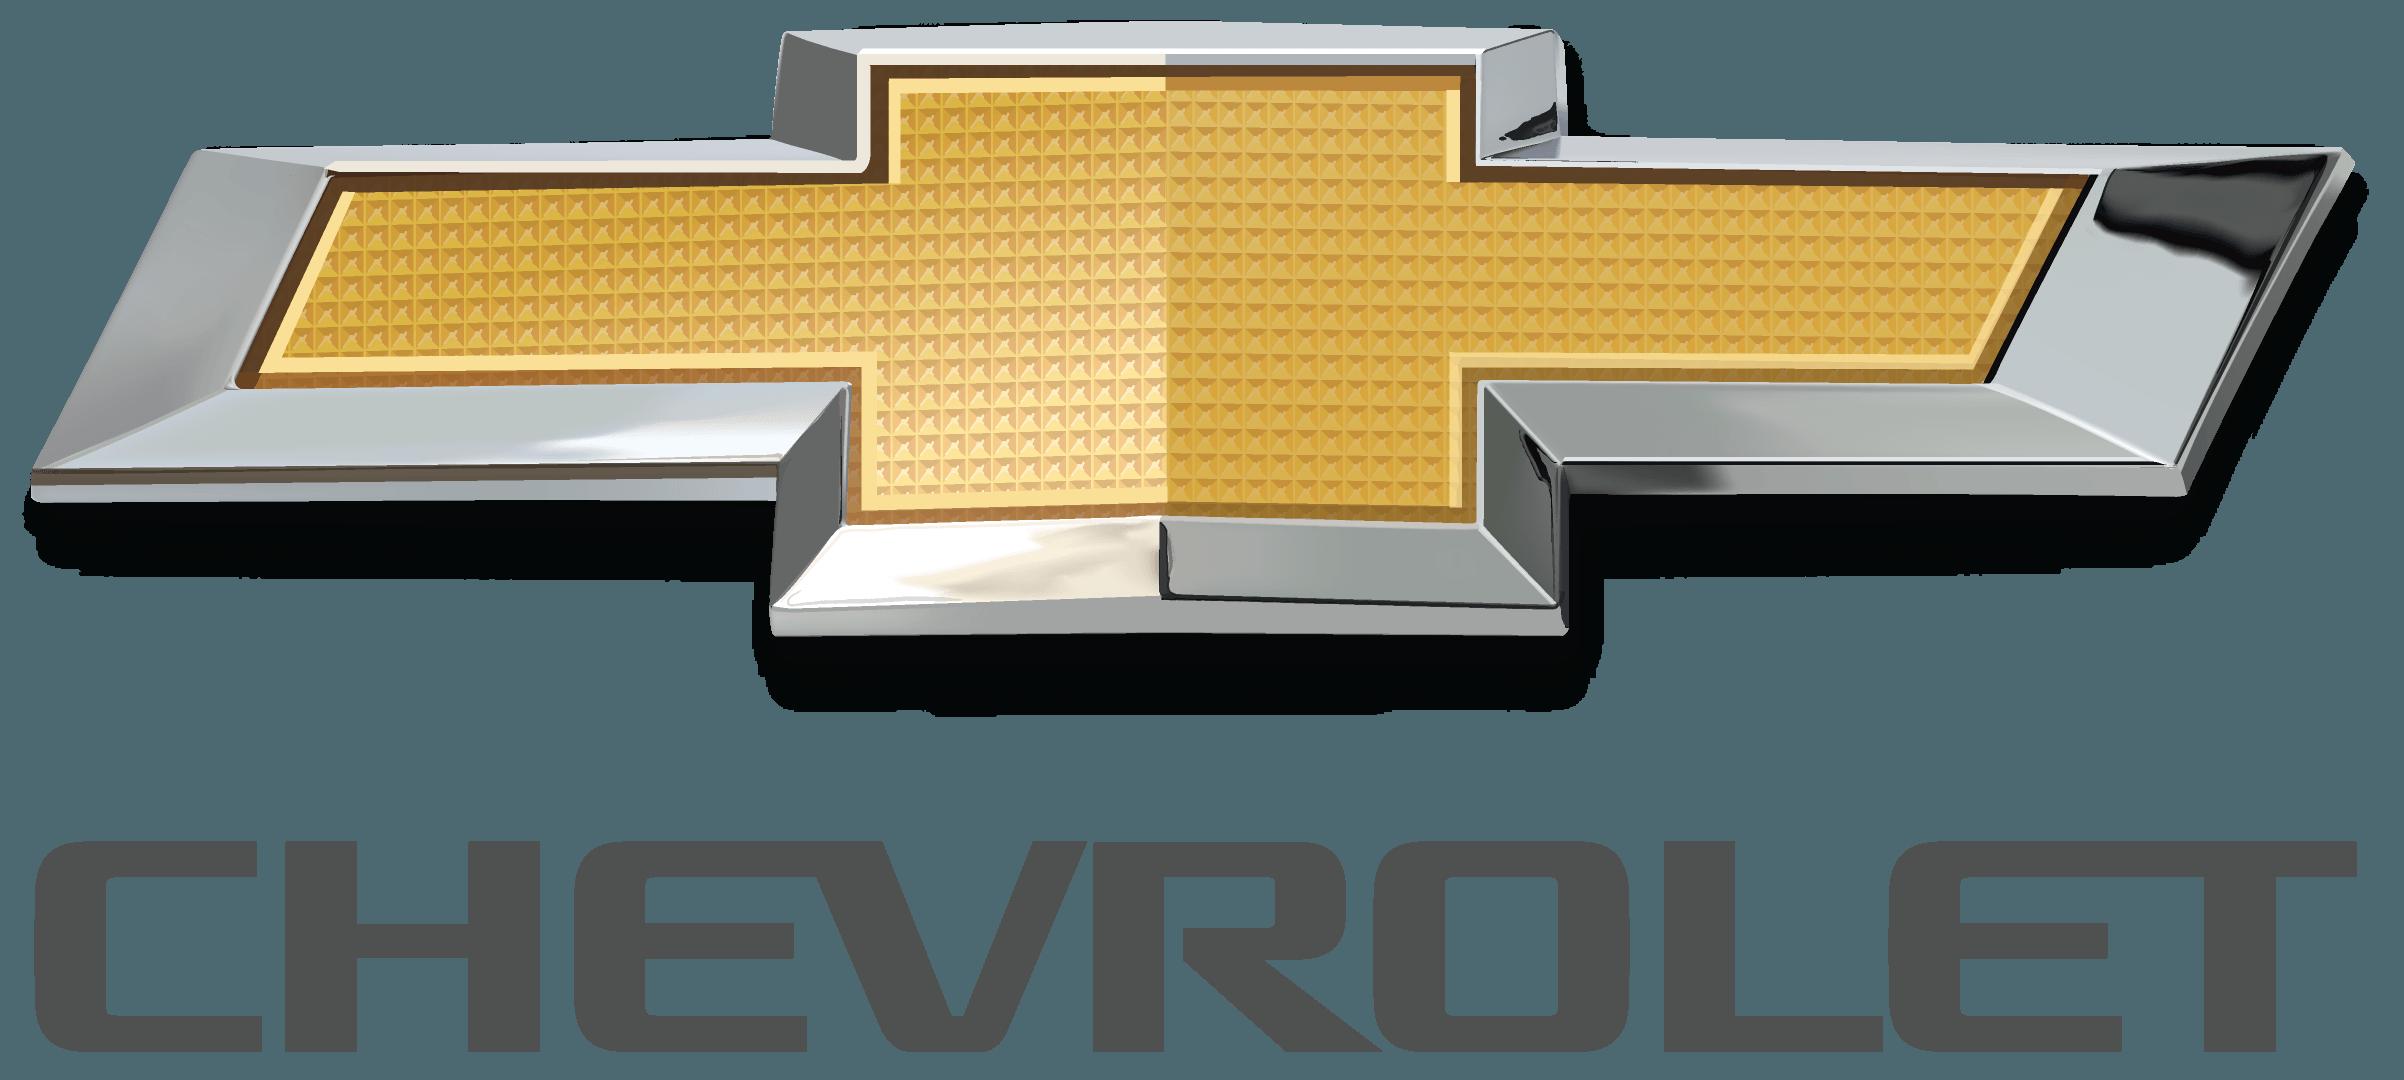 Chevrolet Logo   Chevy png